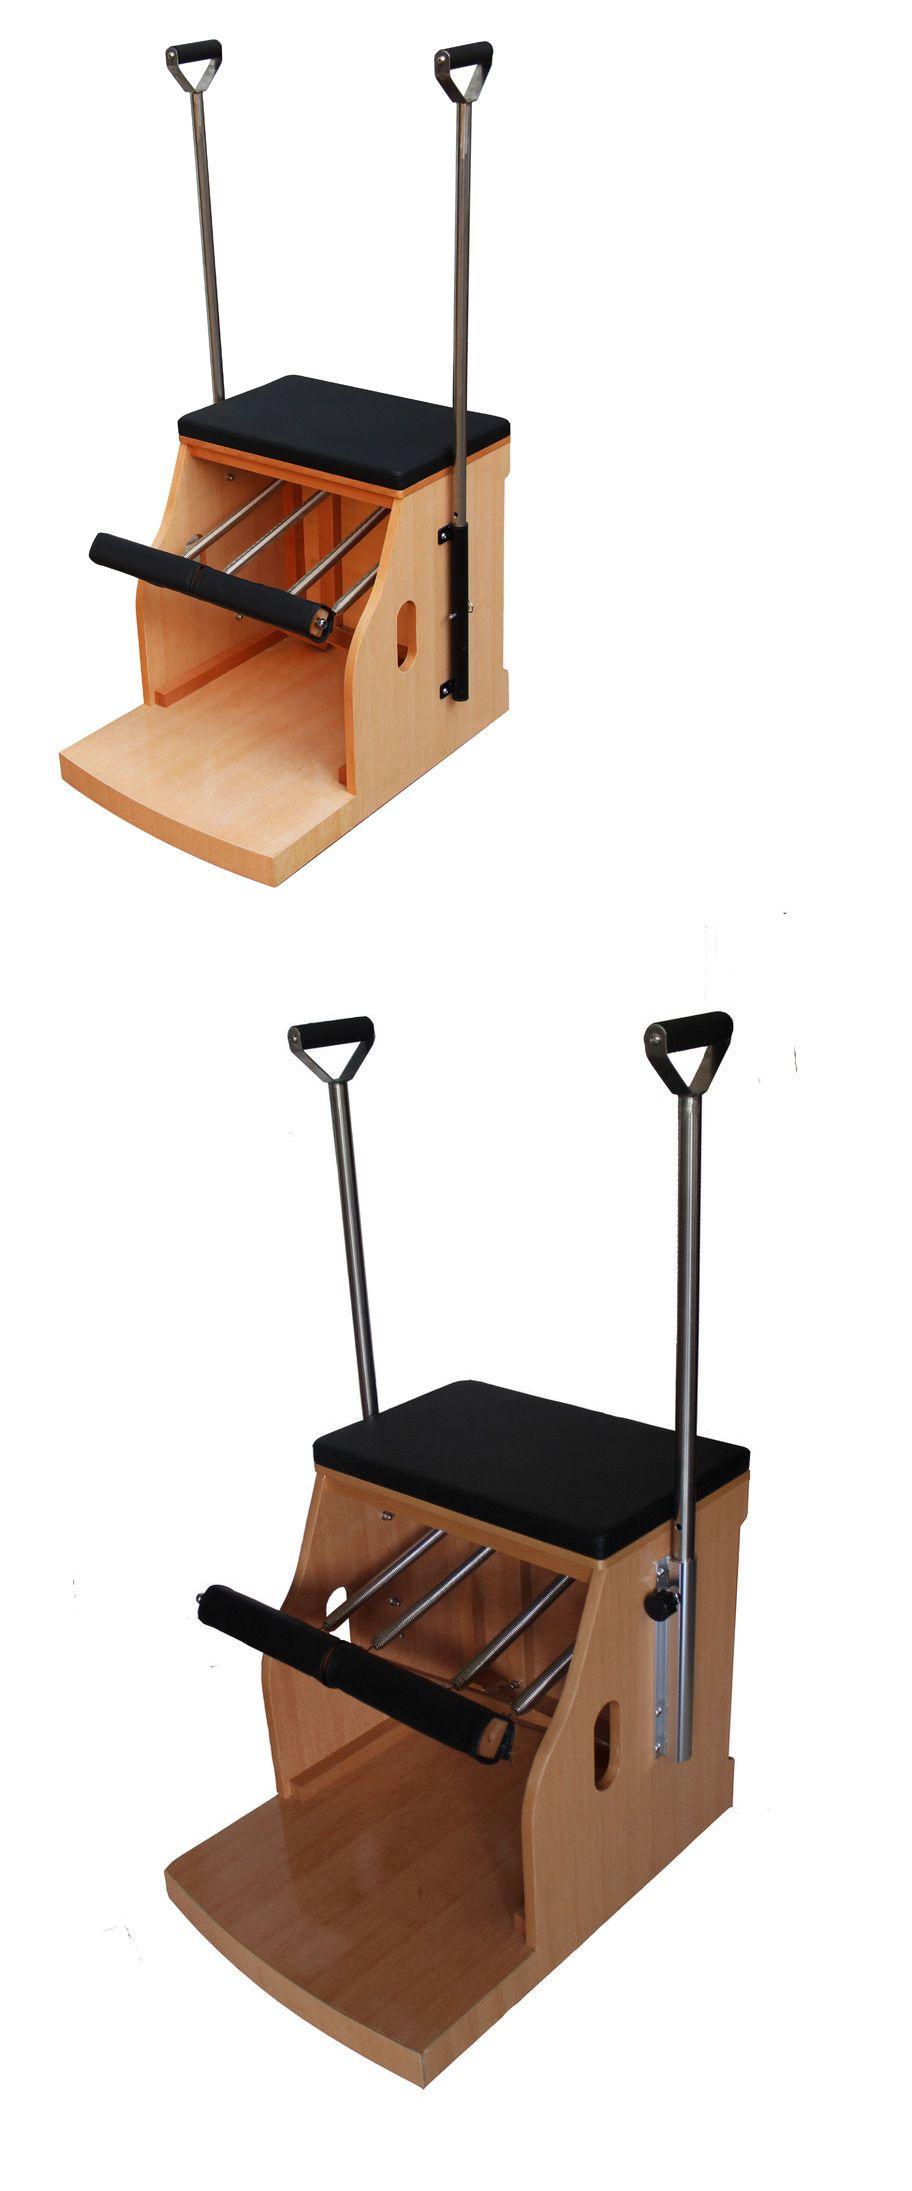 Pilates malibu chair buy malibu chair pilates combo - Pilates Tables 179807 Pilates Combo Chair Buy It Now Only 949 On